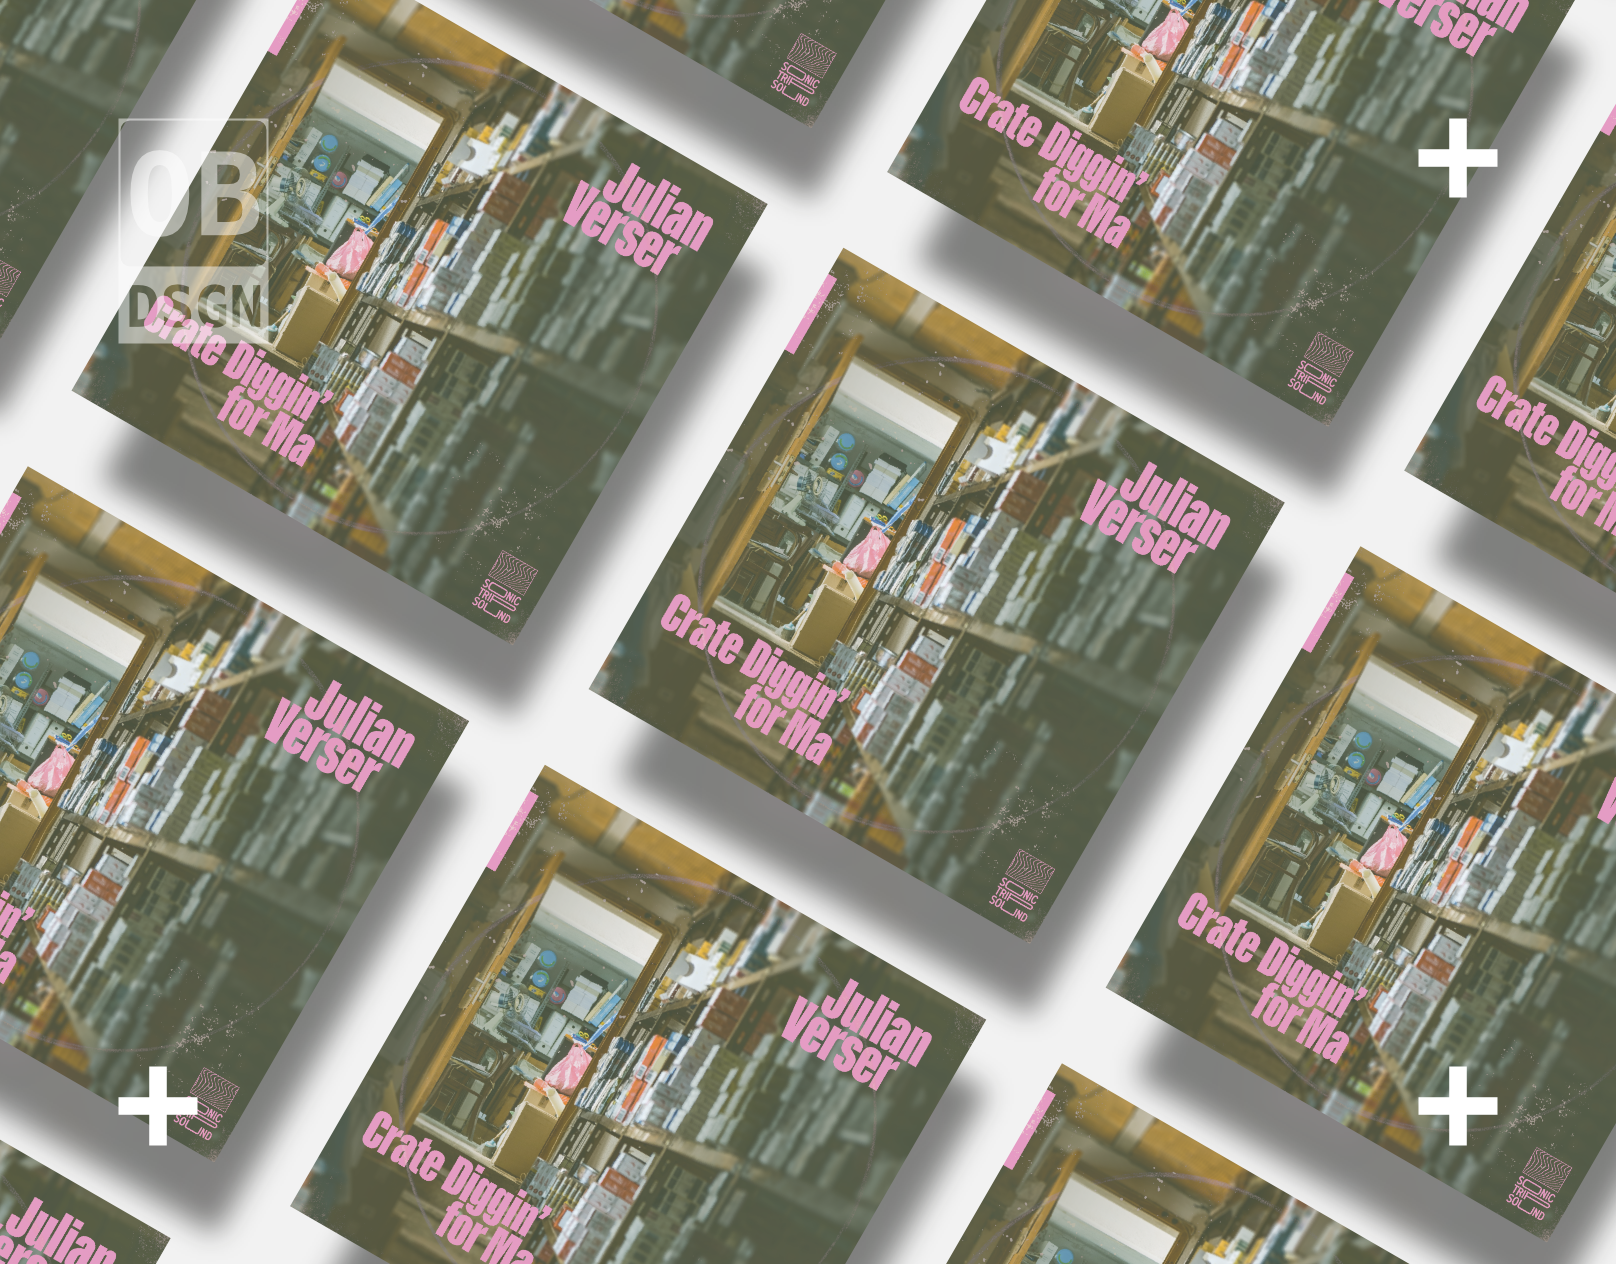 crate diggin' album cover